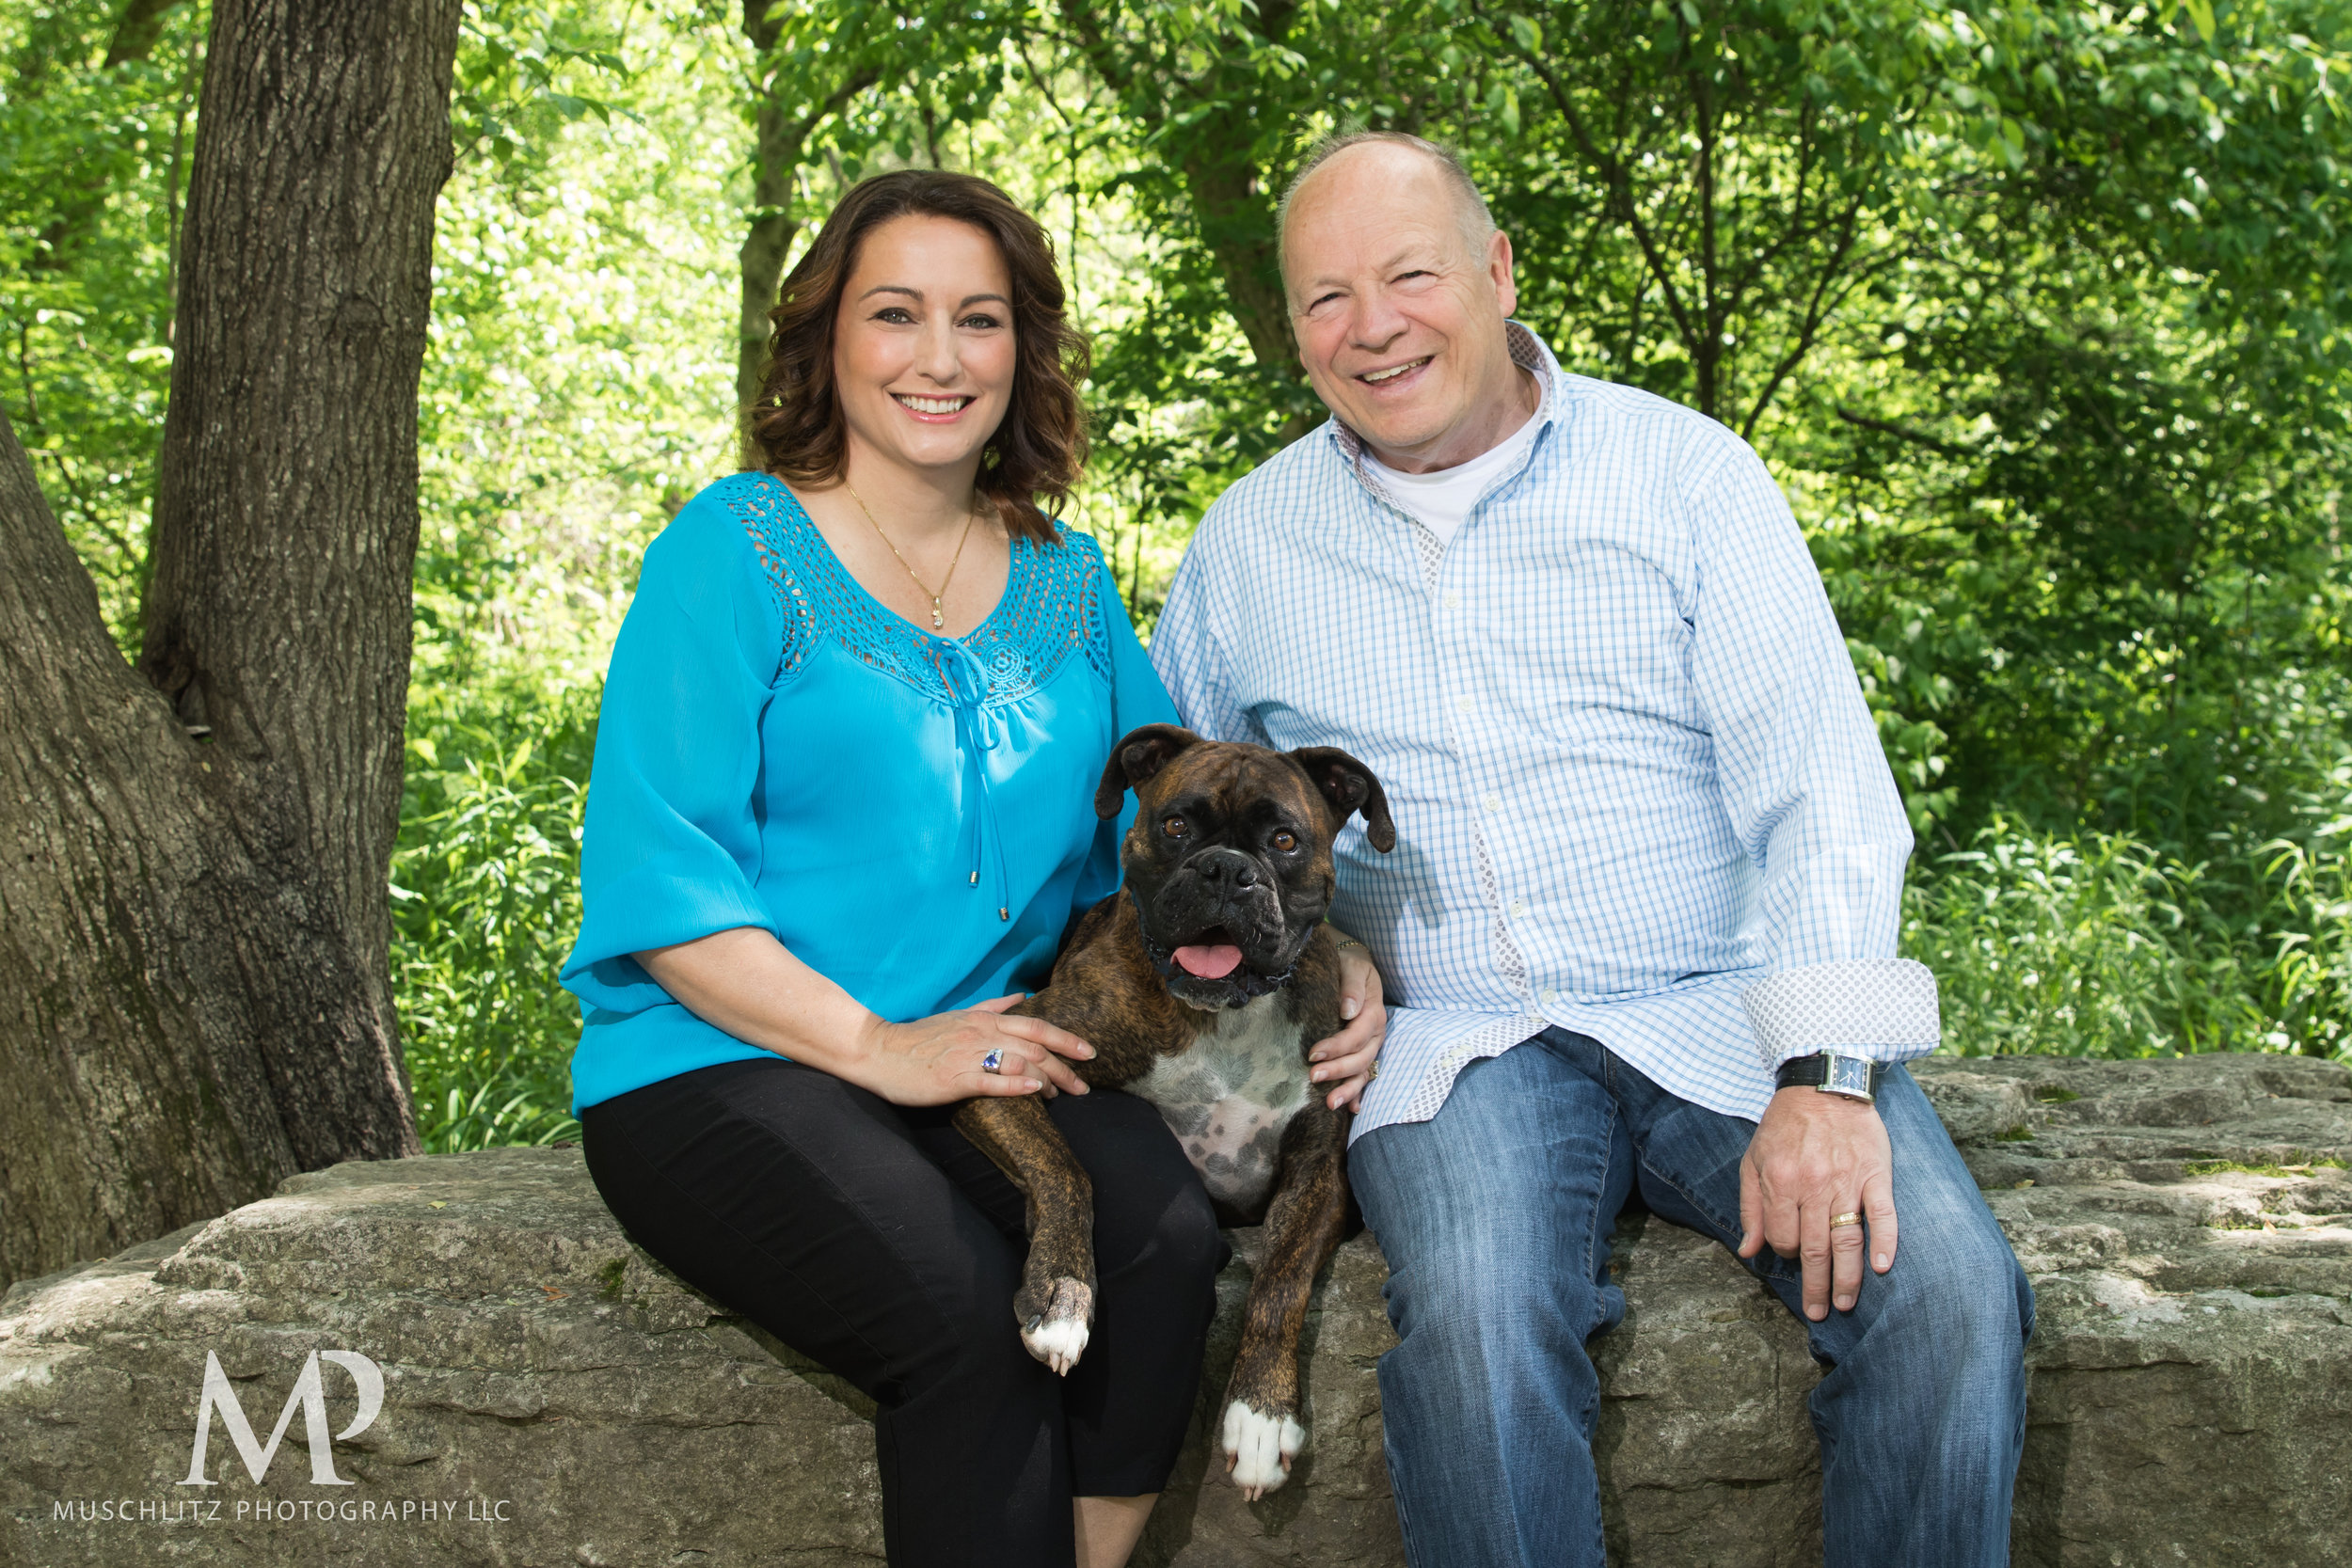 anniversary-couple-portrait-session-creekside-park-plaza-gahanna-ohio-boxer-dog-muschlitz-photography-002.JPG